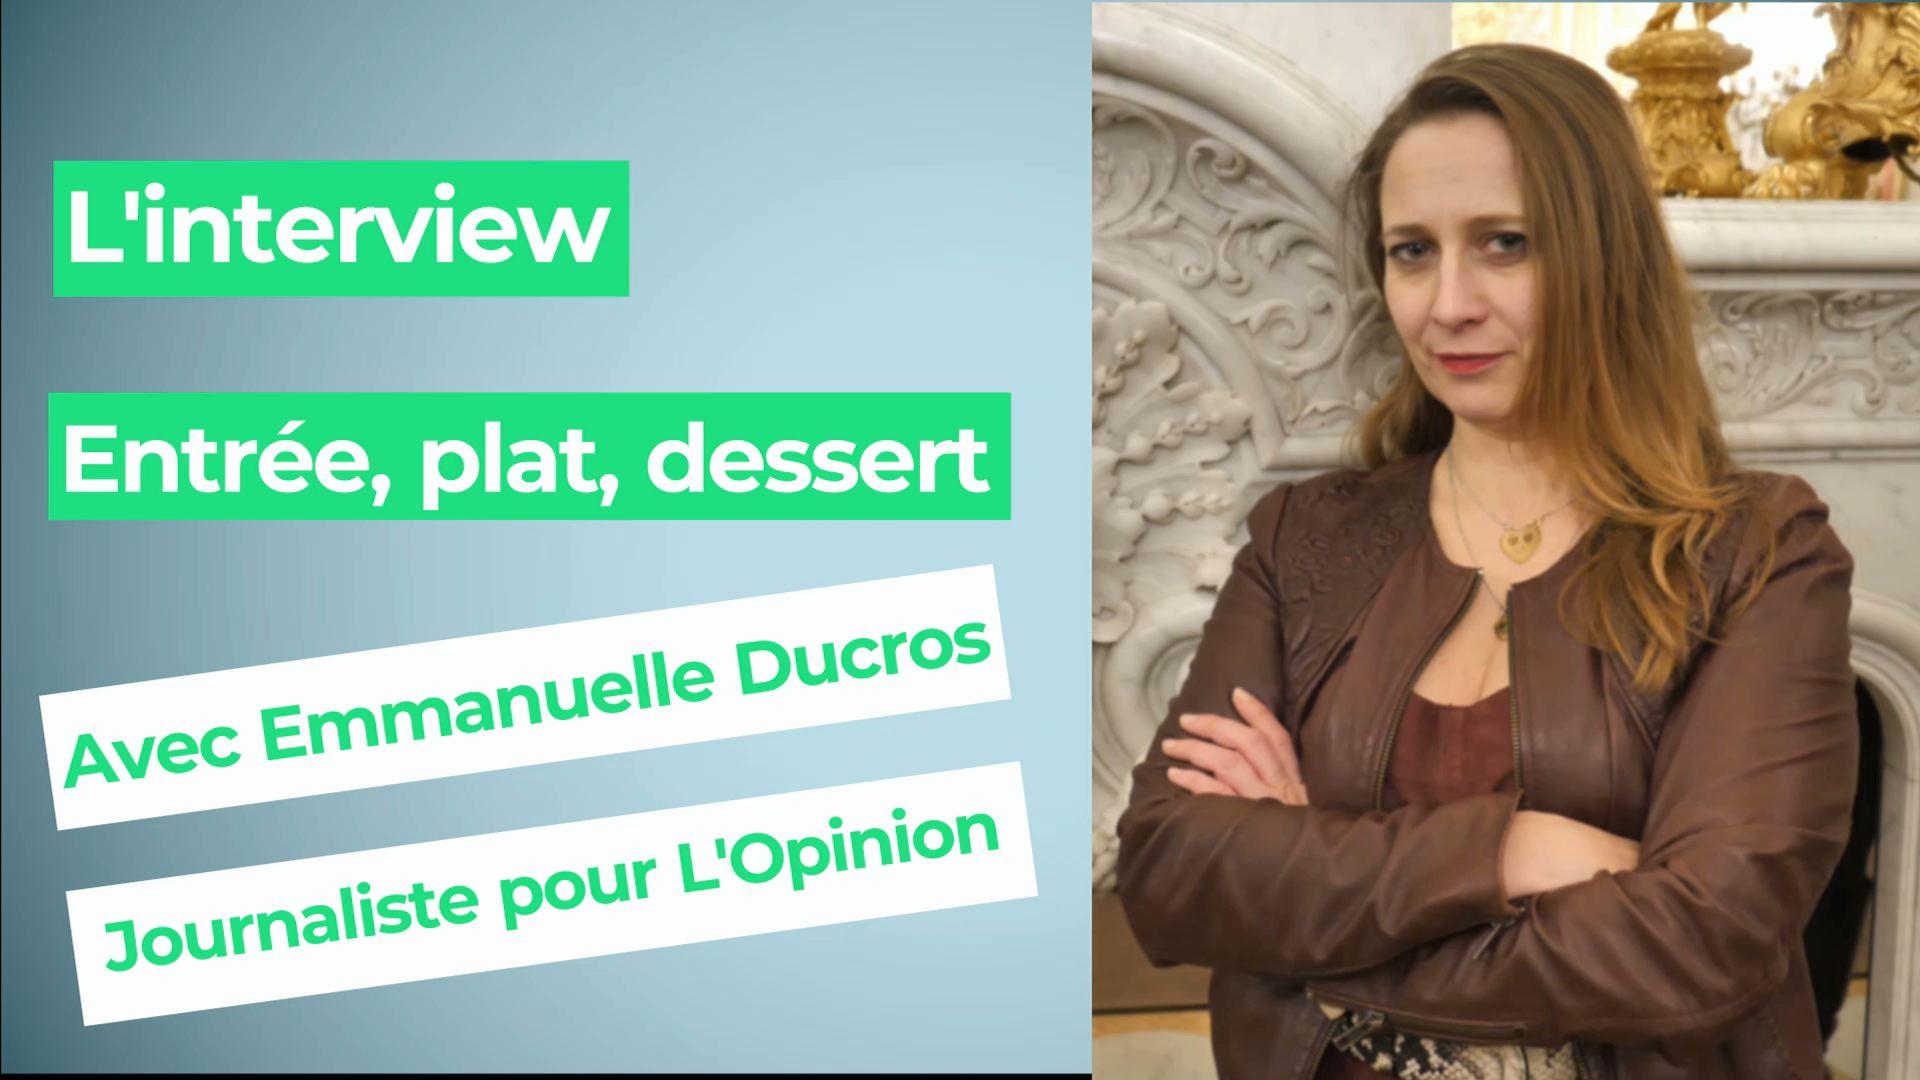 Emmanuelle Ducros, journaliste :